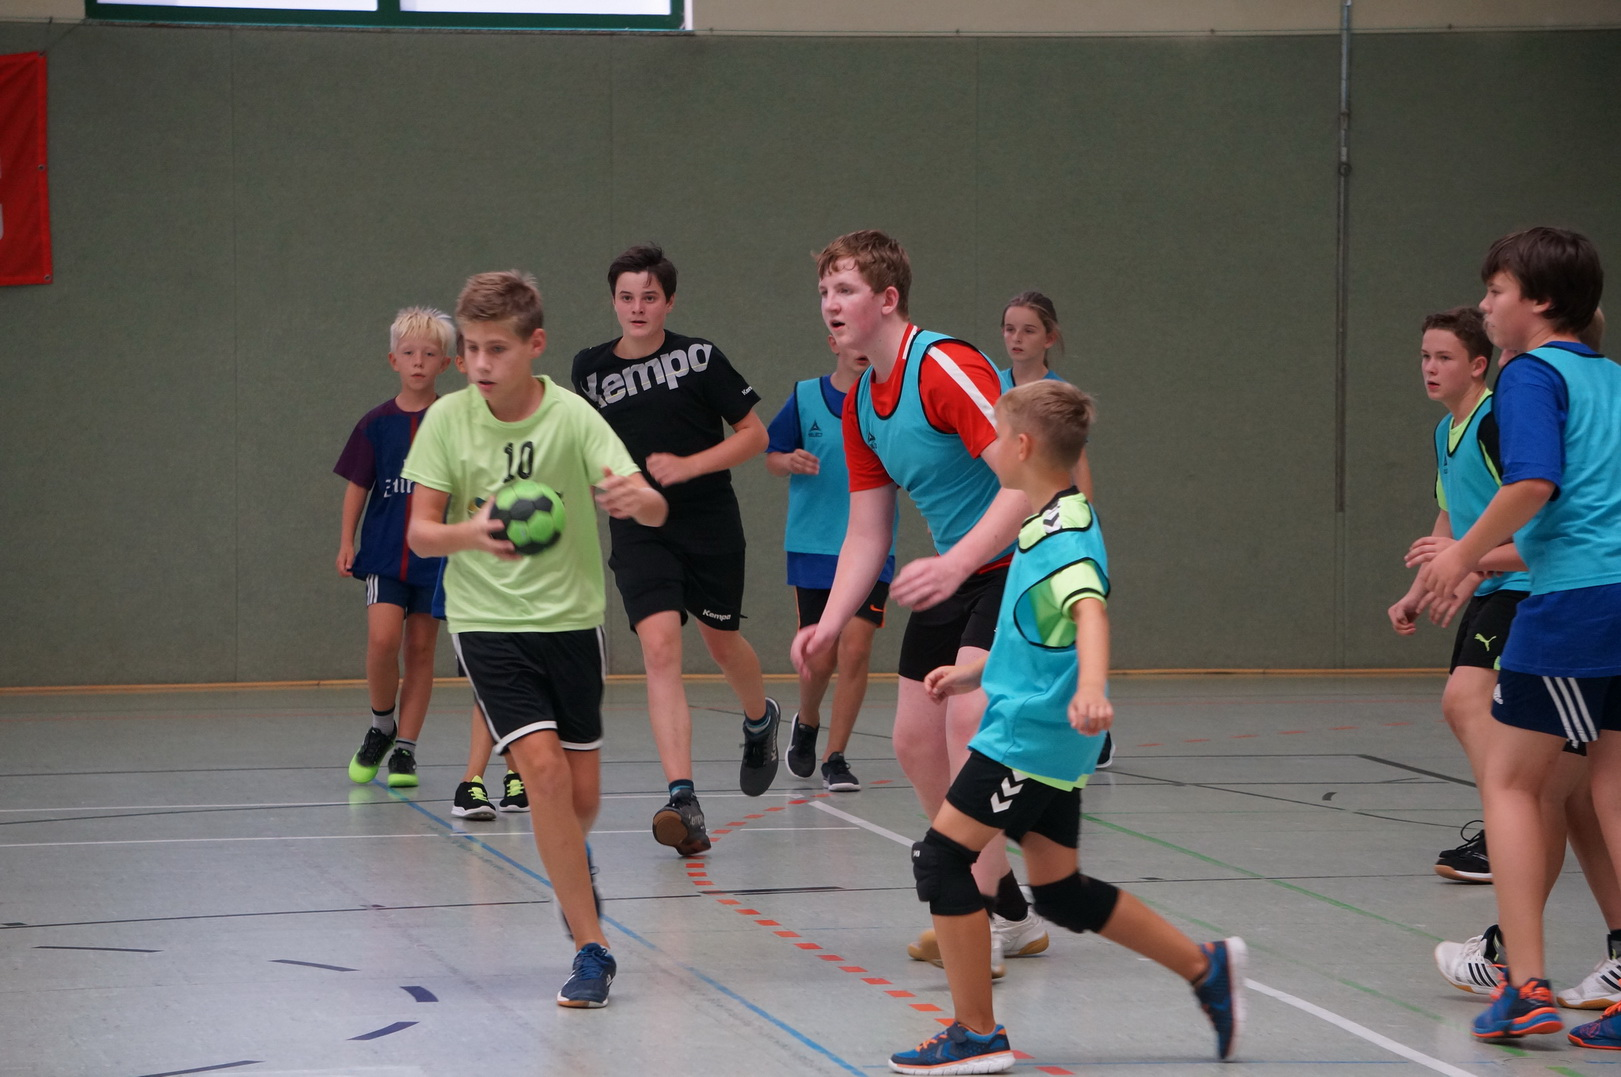 201808_Handballcamp_SDH_MG_110w